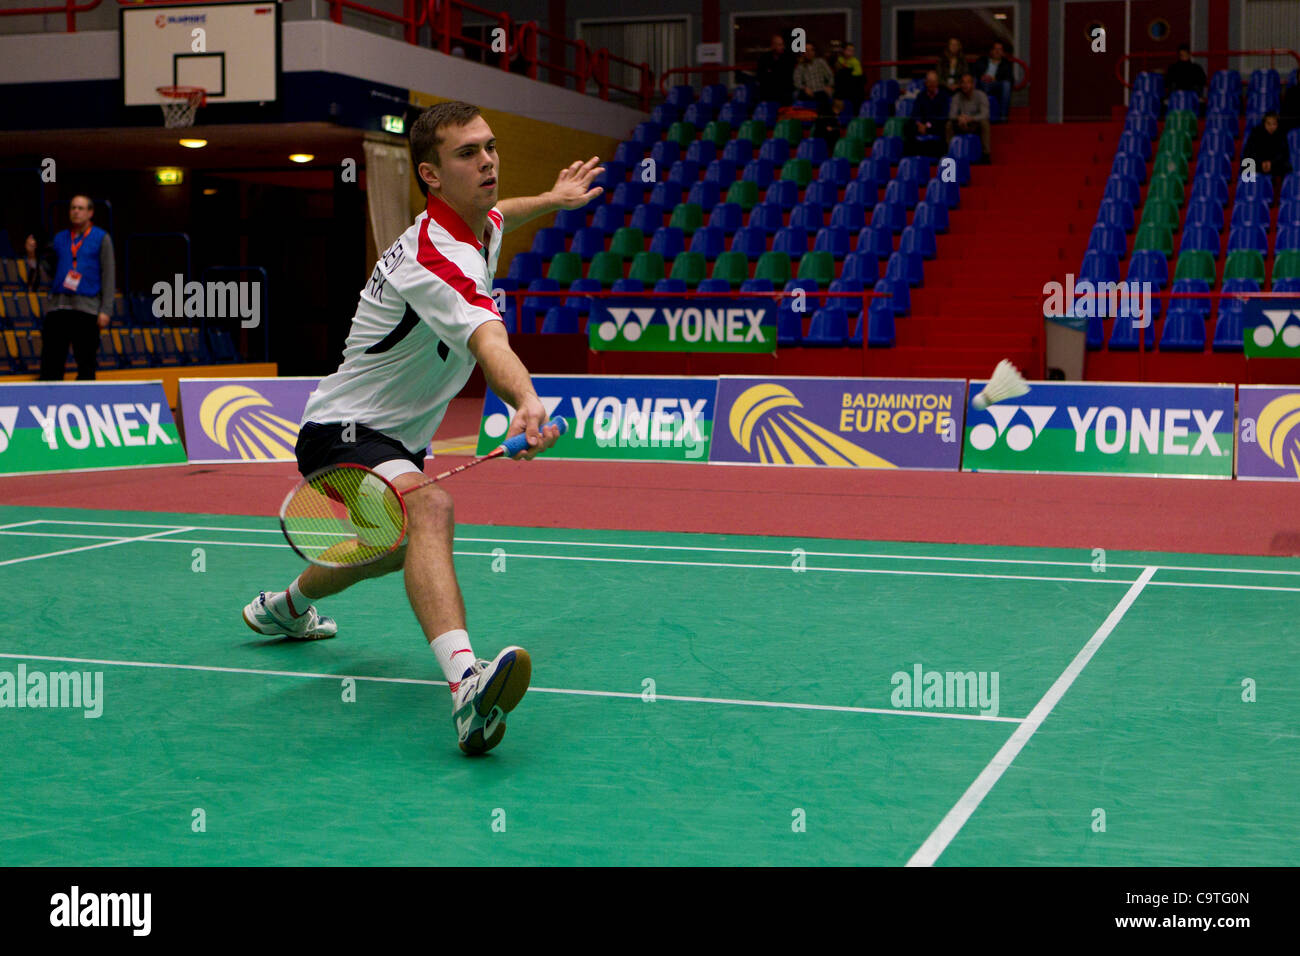 AMSTERDAM, THE NETHERLANDS, 18/02/2012. Badminton player Jan Ø. Jørgensen (Denmark) leads his team to - Stock Image